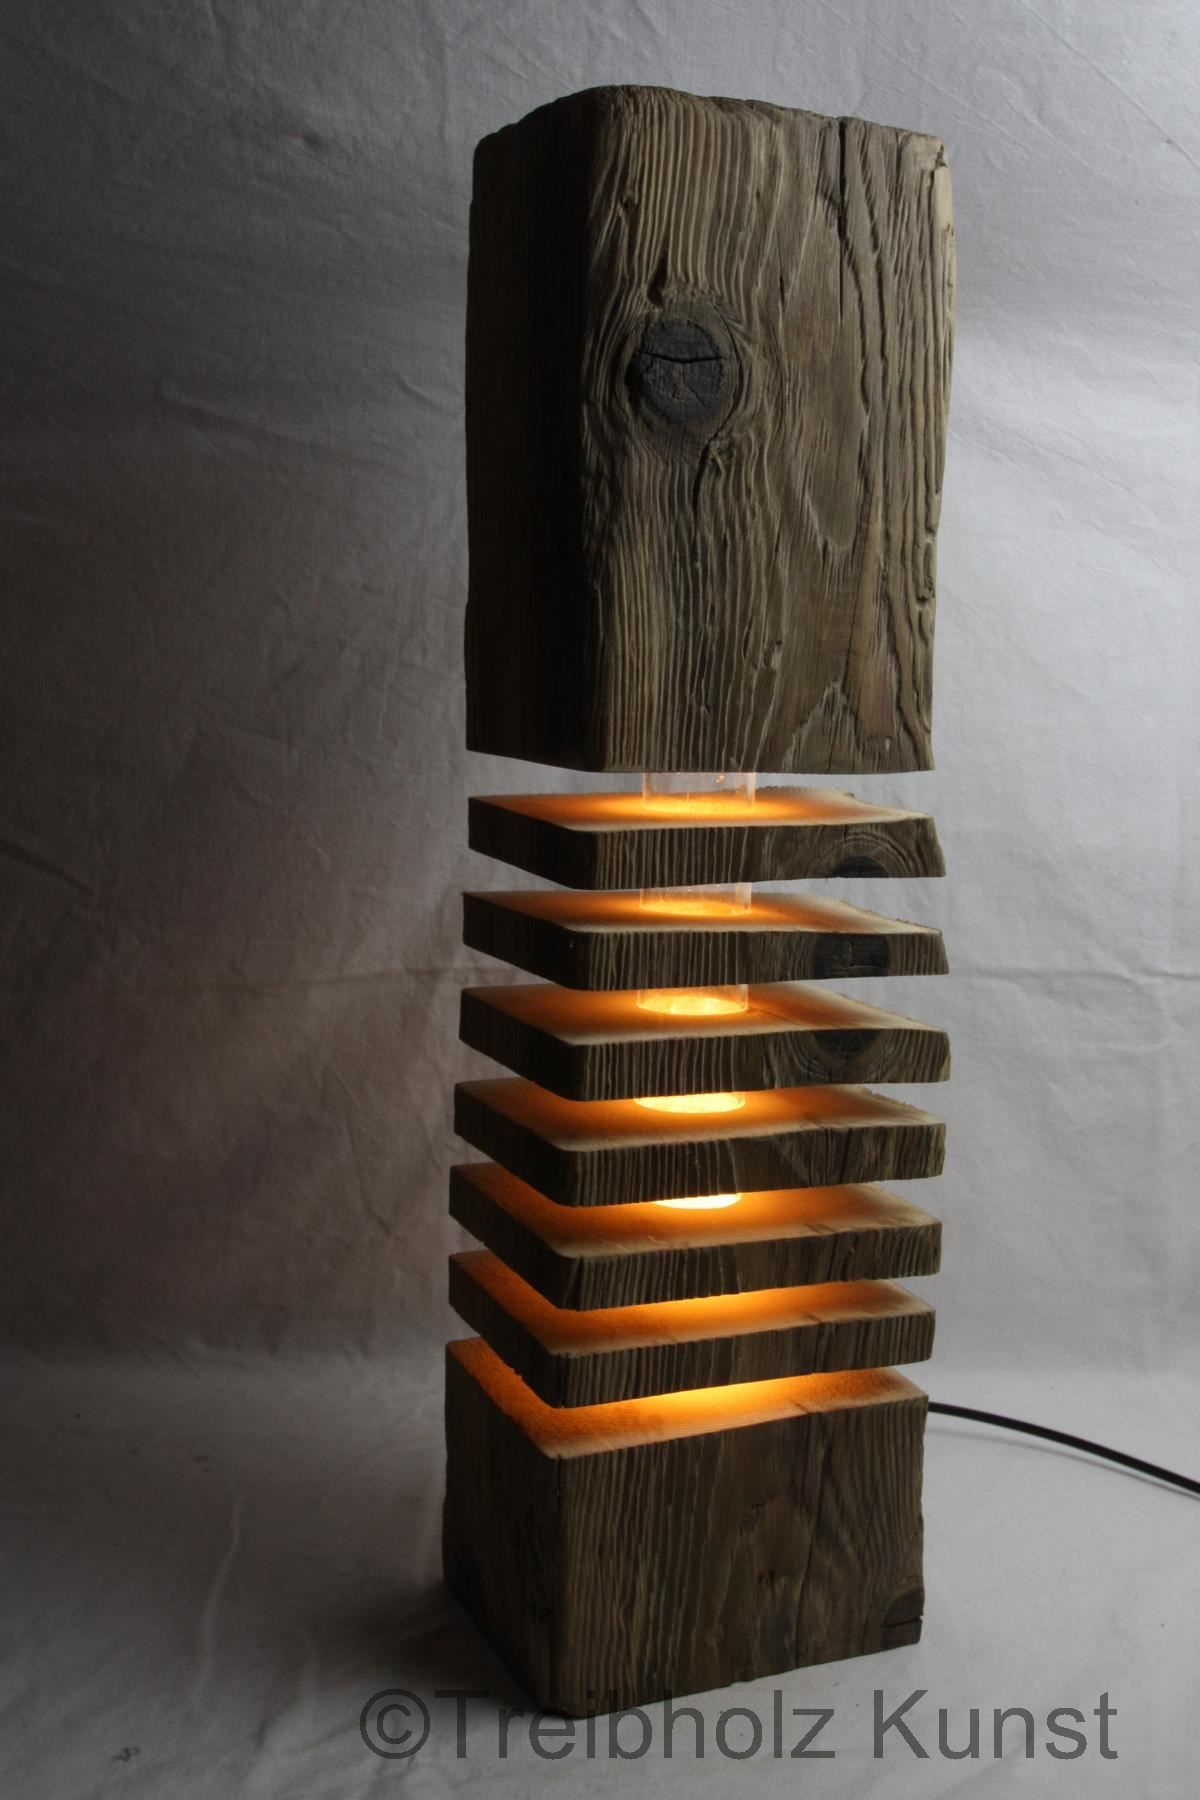 Treibholz Lampe Stehlampe Holz LED Leuchte Treibholzlampe Altholz Schwemmholz